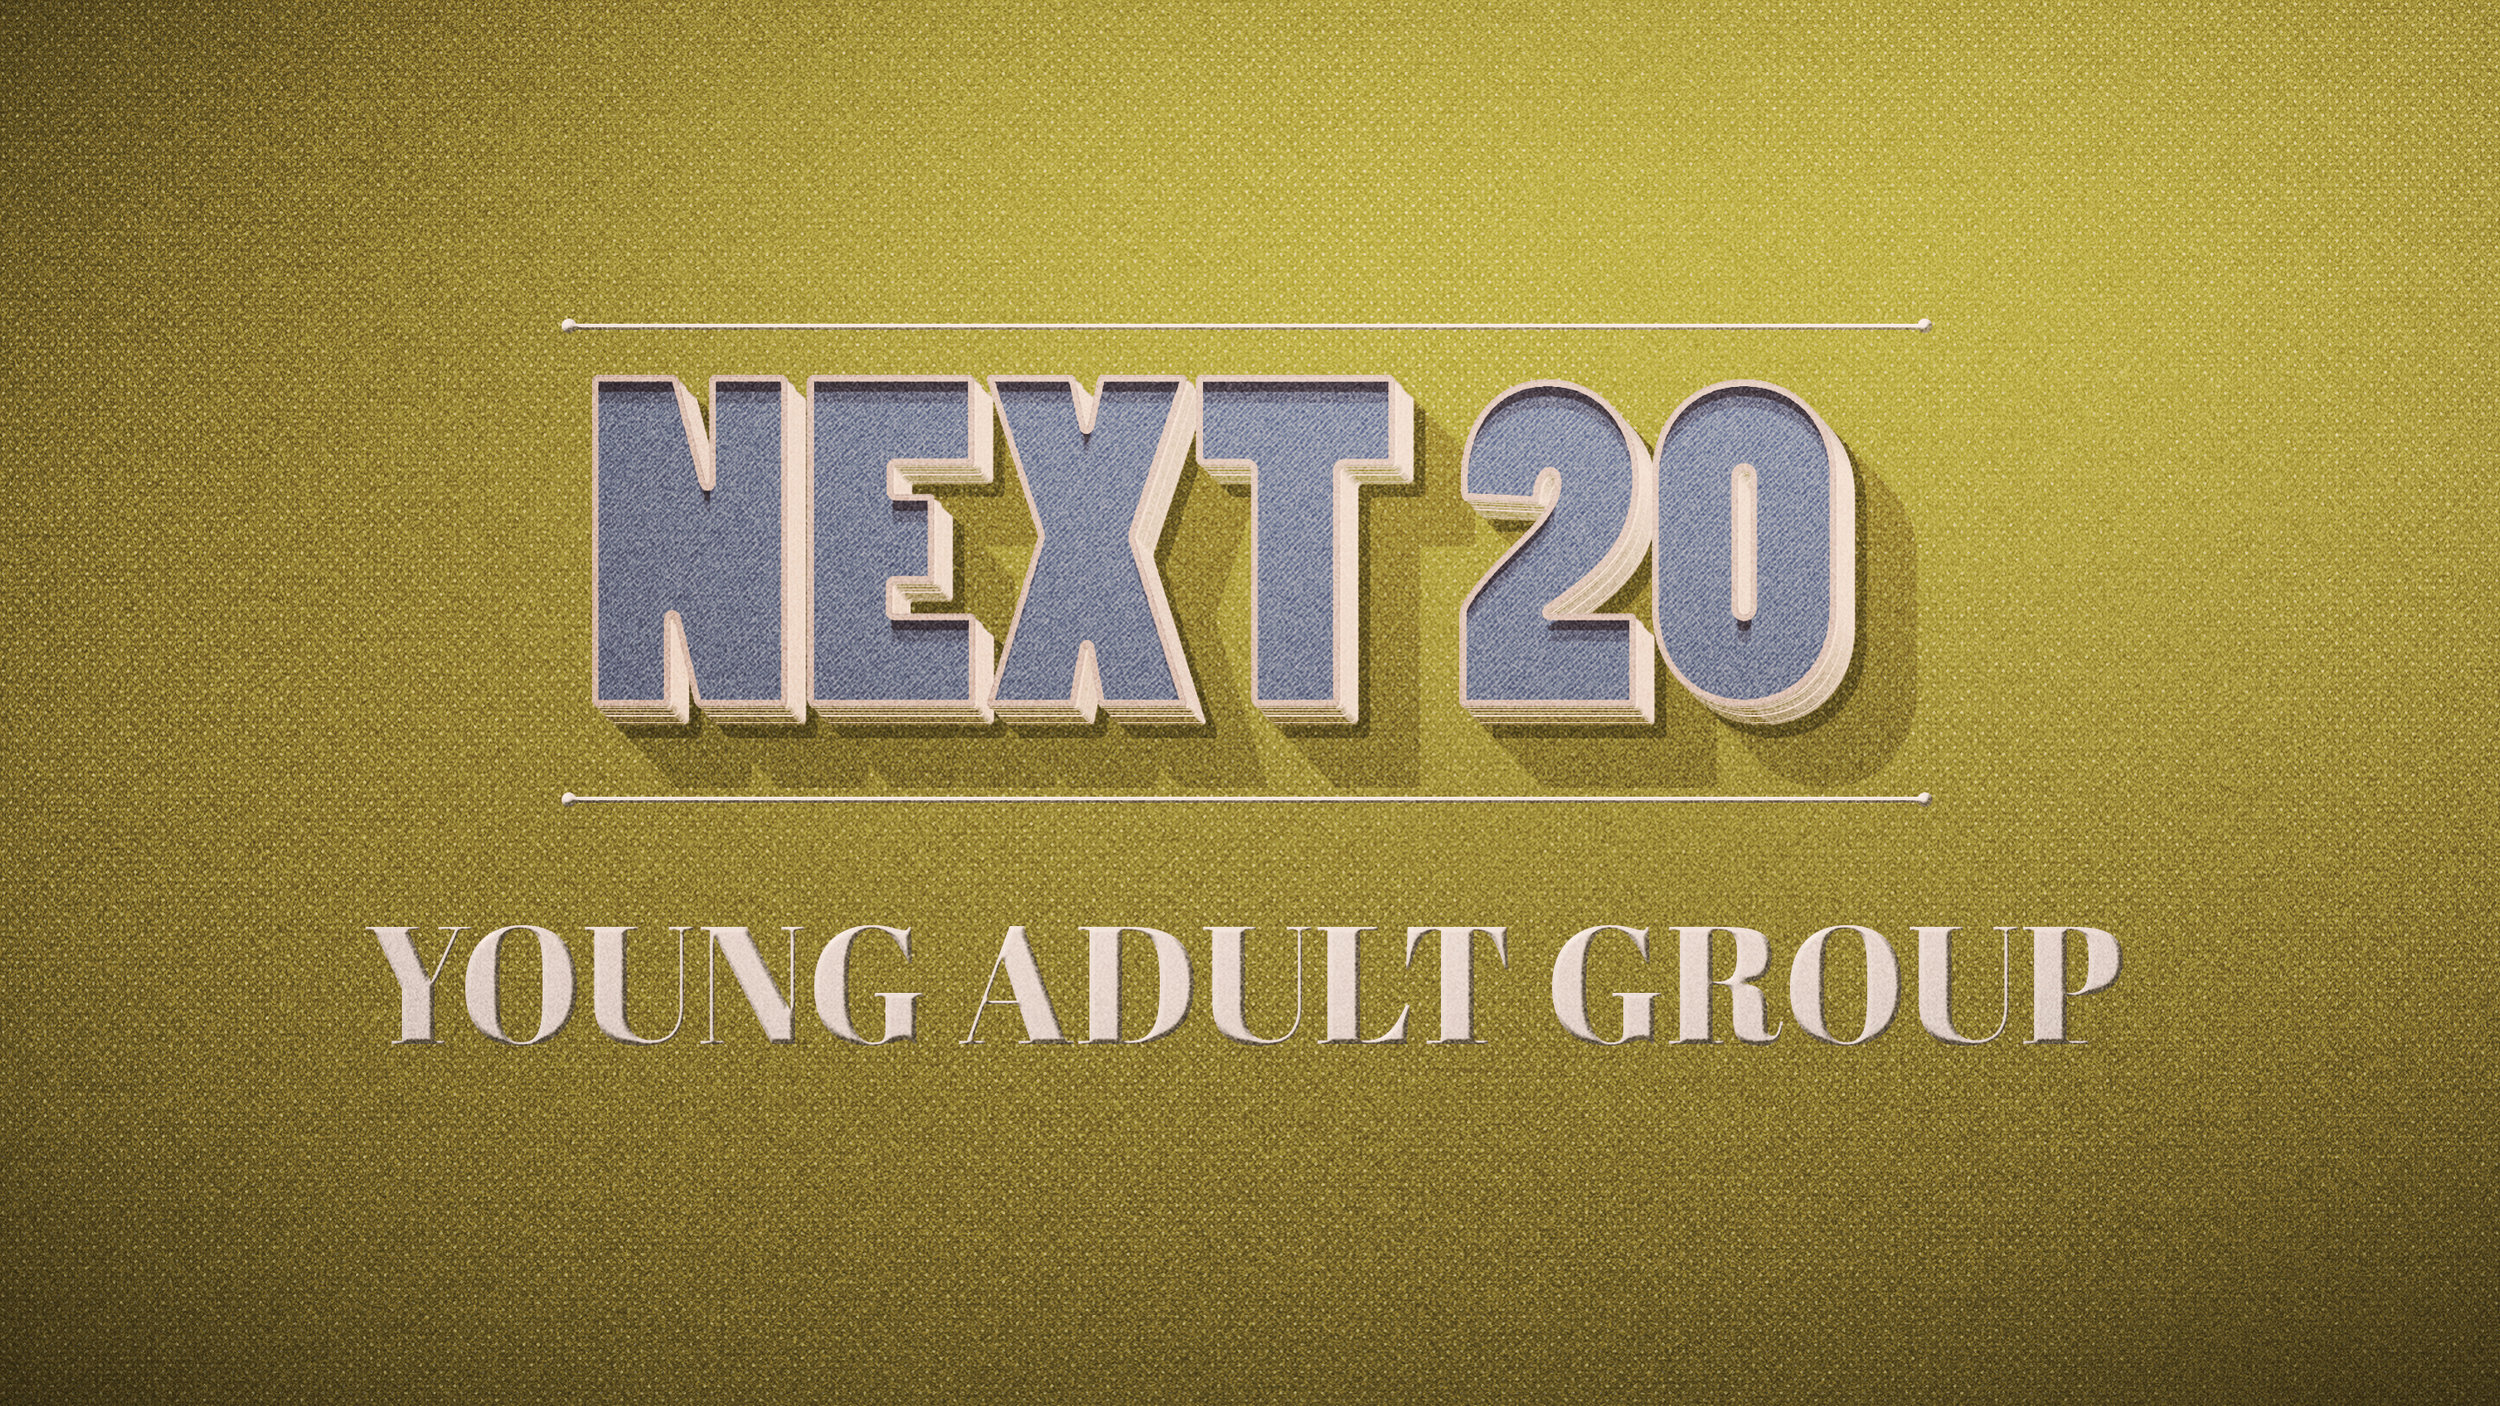 young adult group slide web.jpg